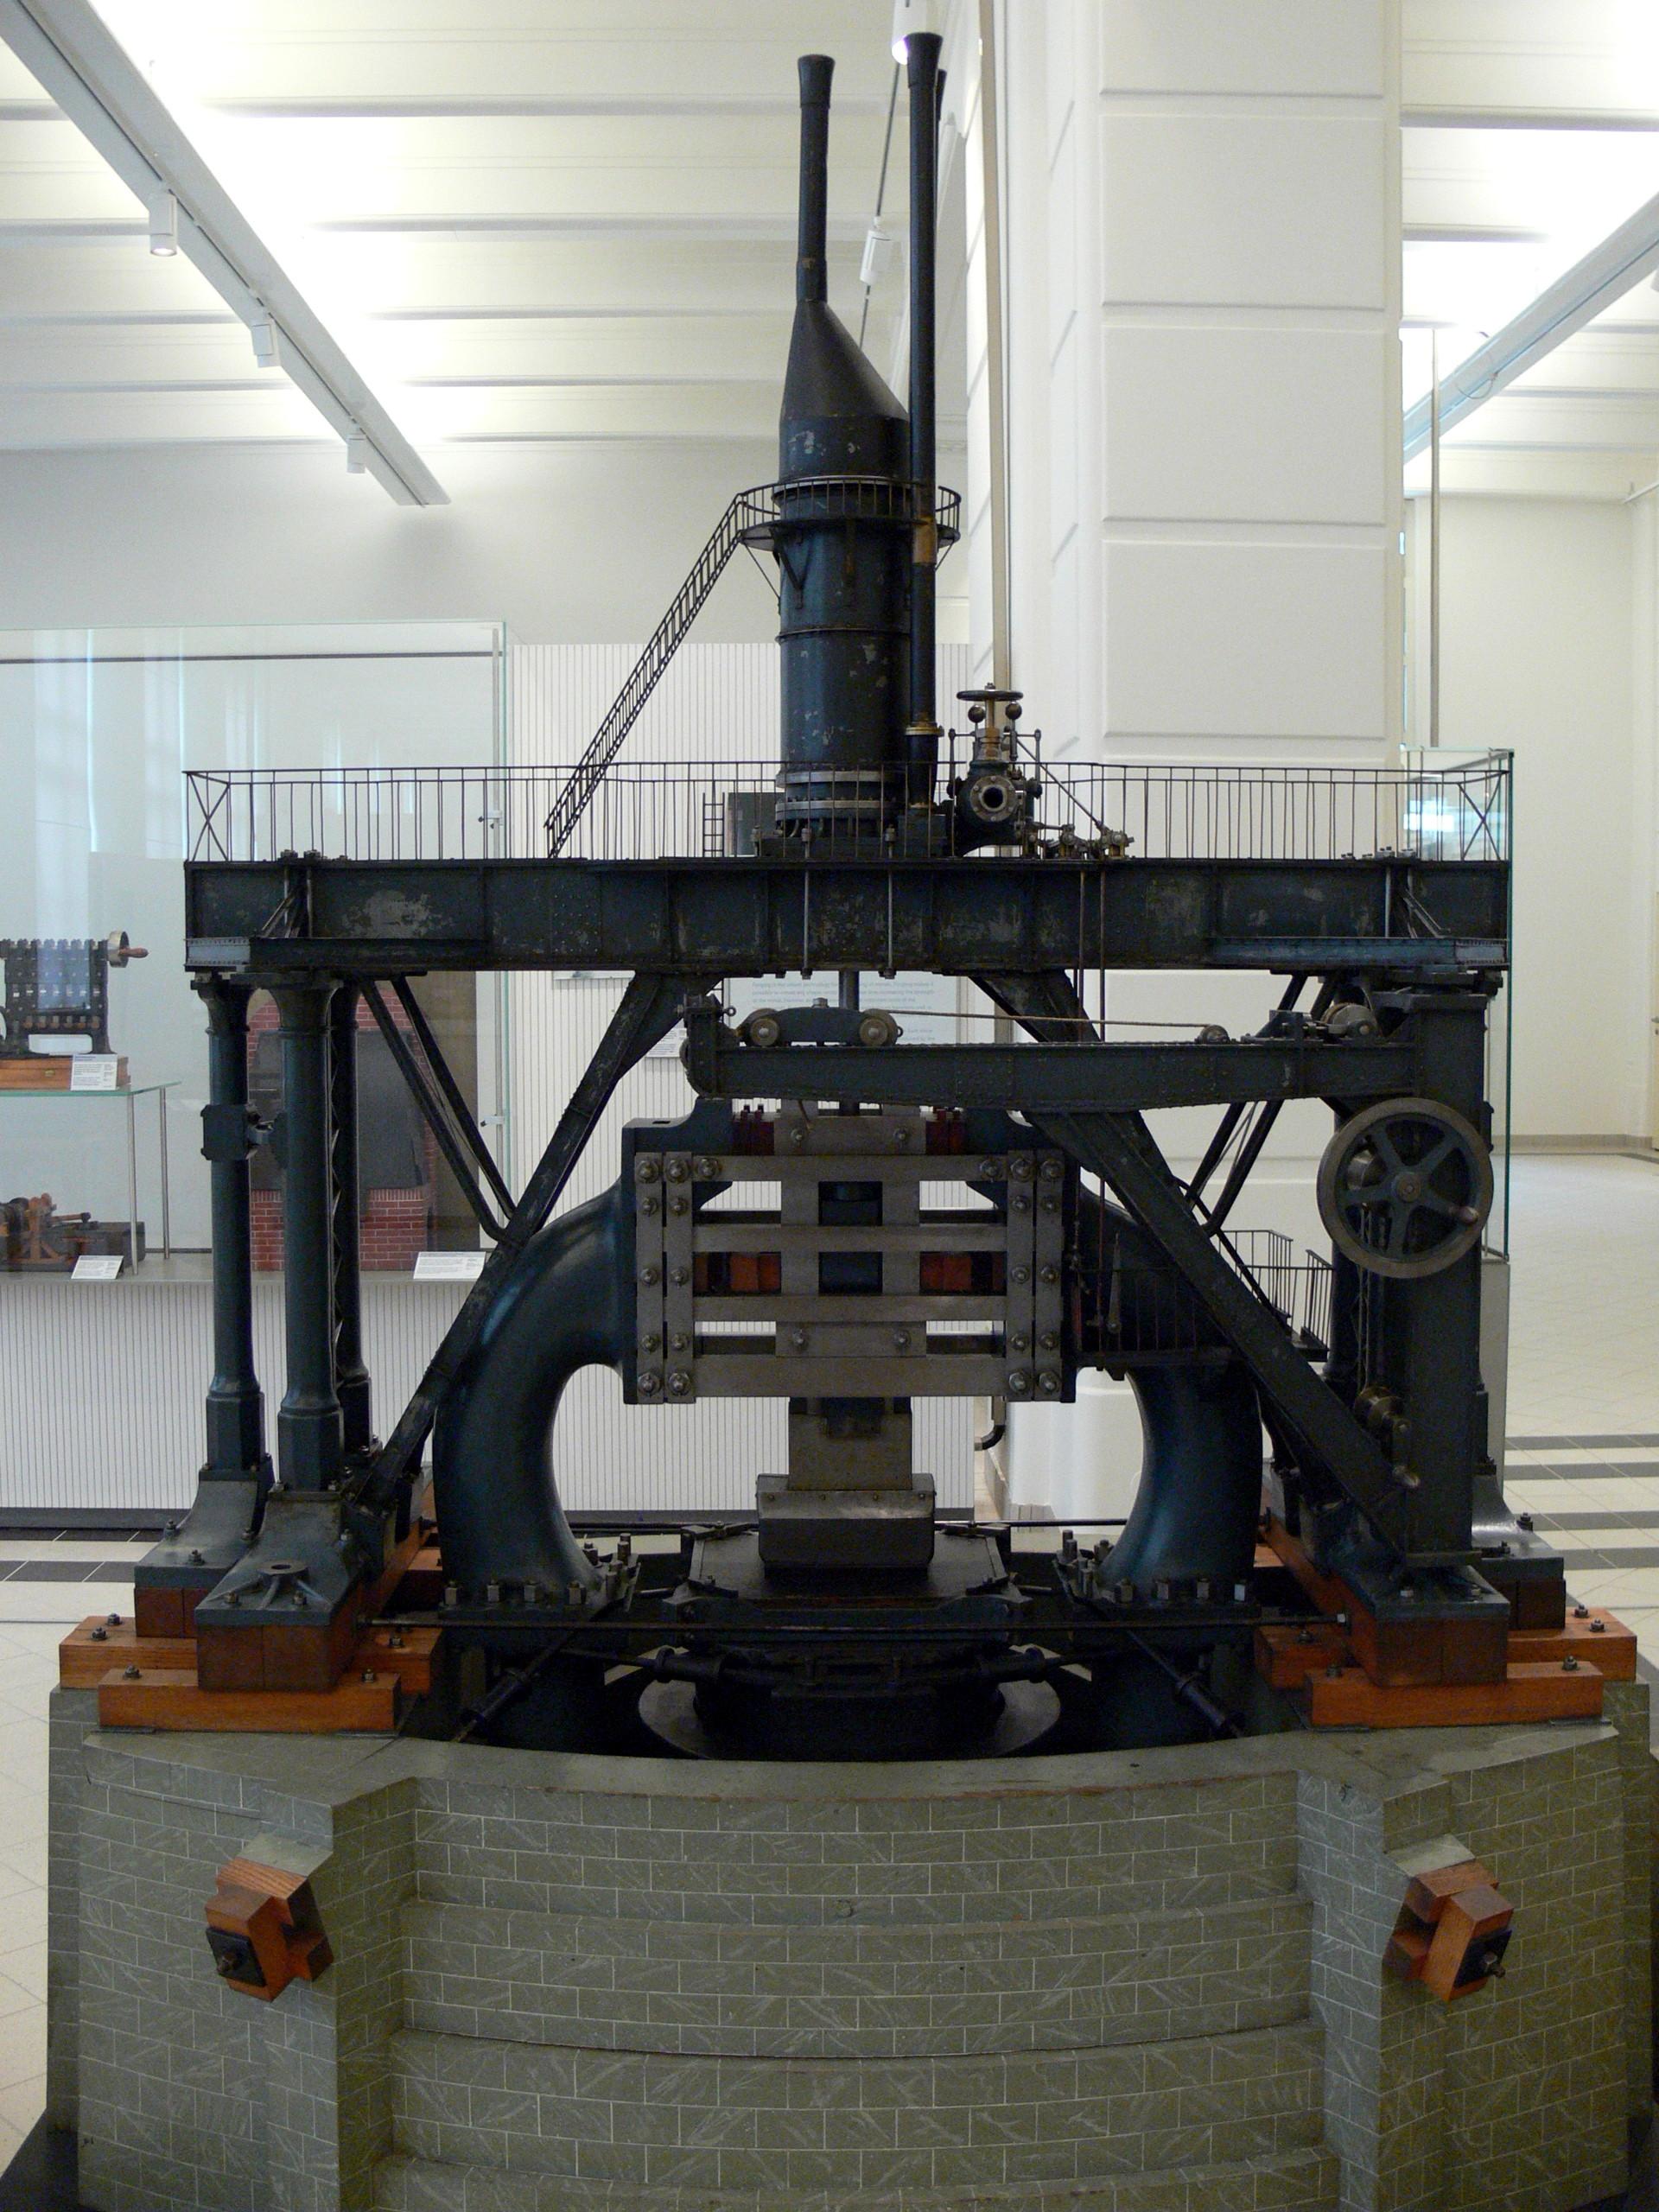 File:TMW - Dampfhammer Fritz.jpg - Wikimedia Commons